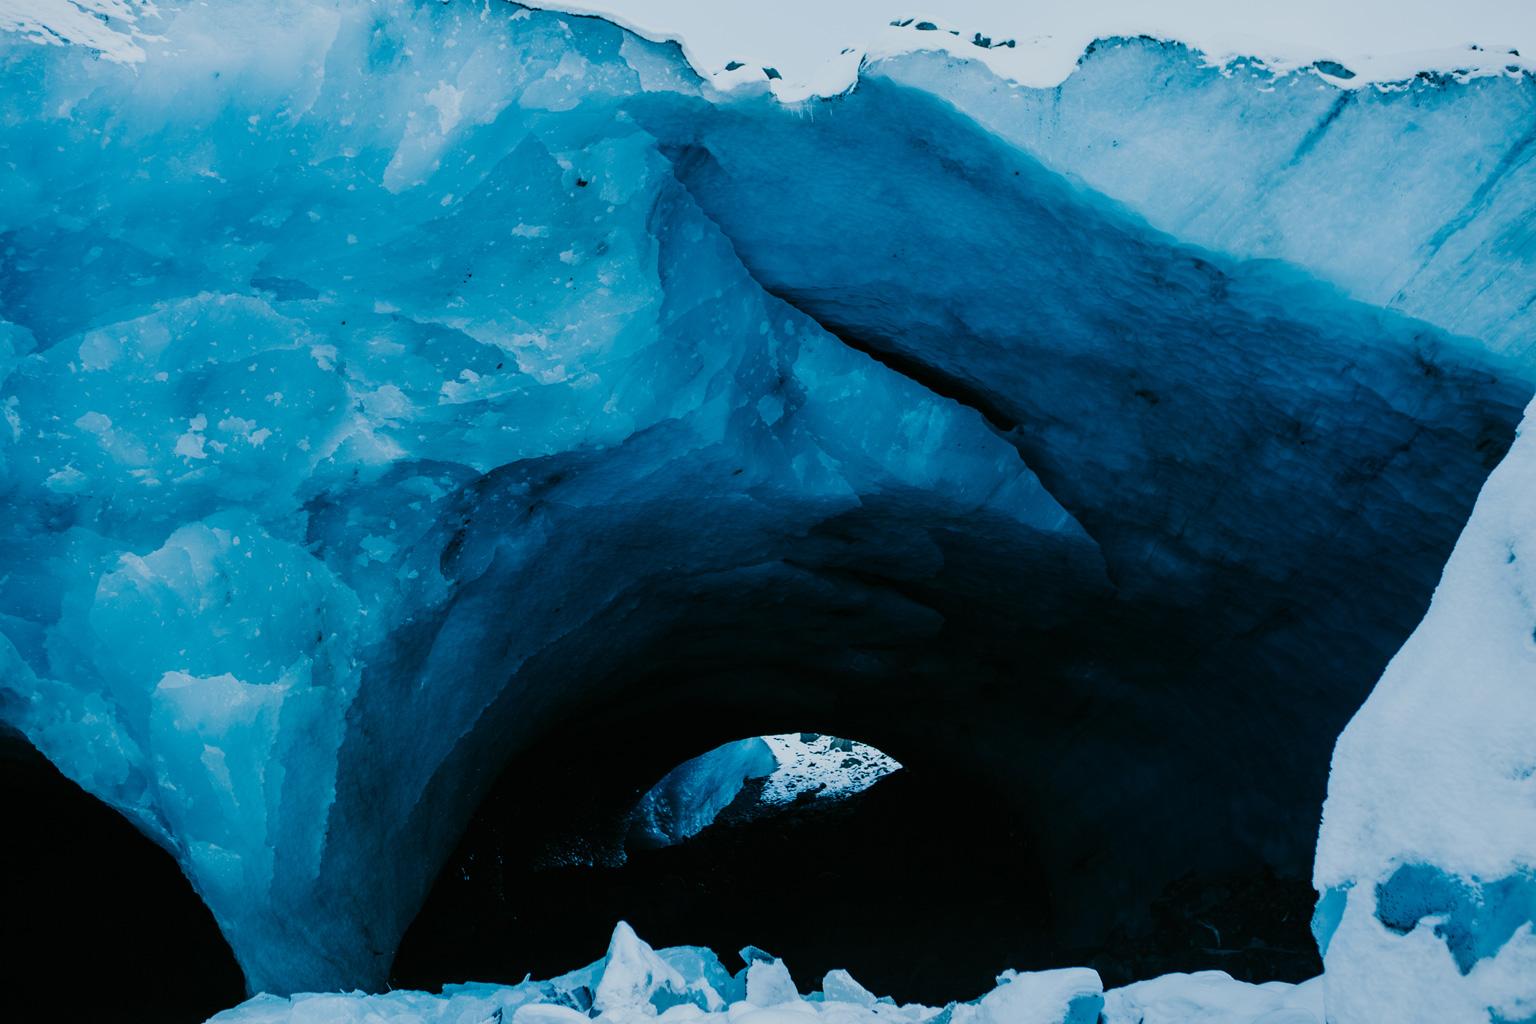 CindyGiovagnoli_hiking_glacier_Anchorage_snow_winter_ByronGlacier_Alaska-025.jpg